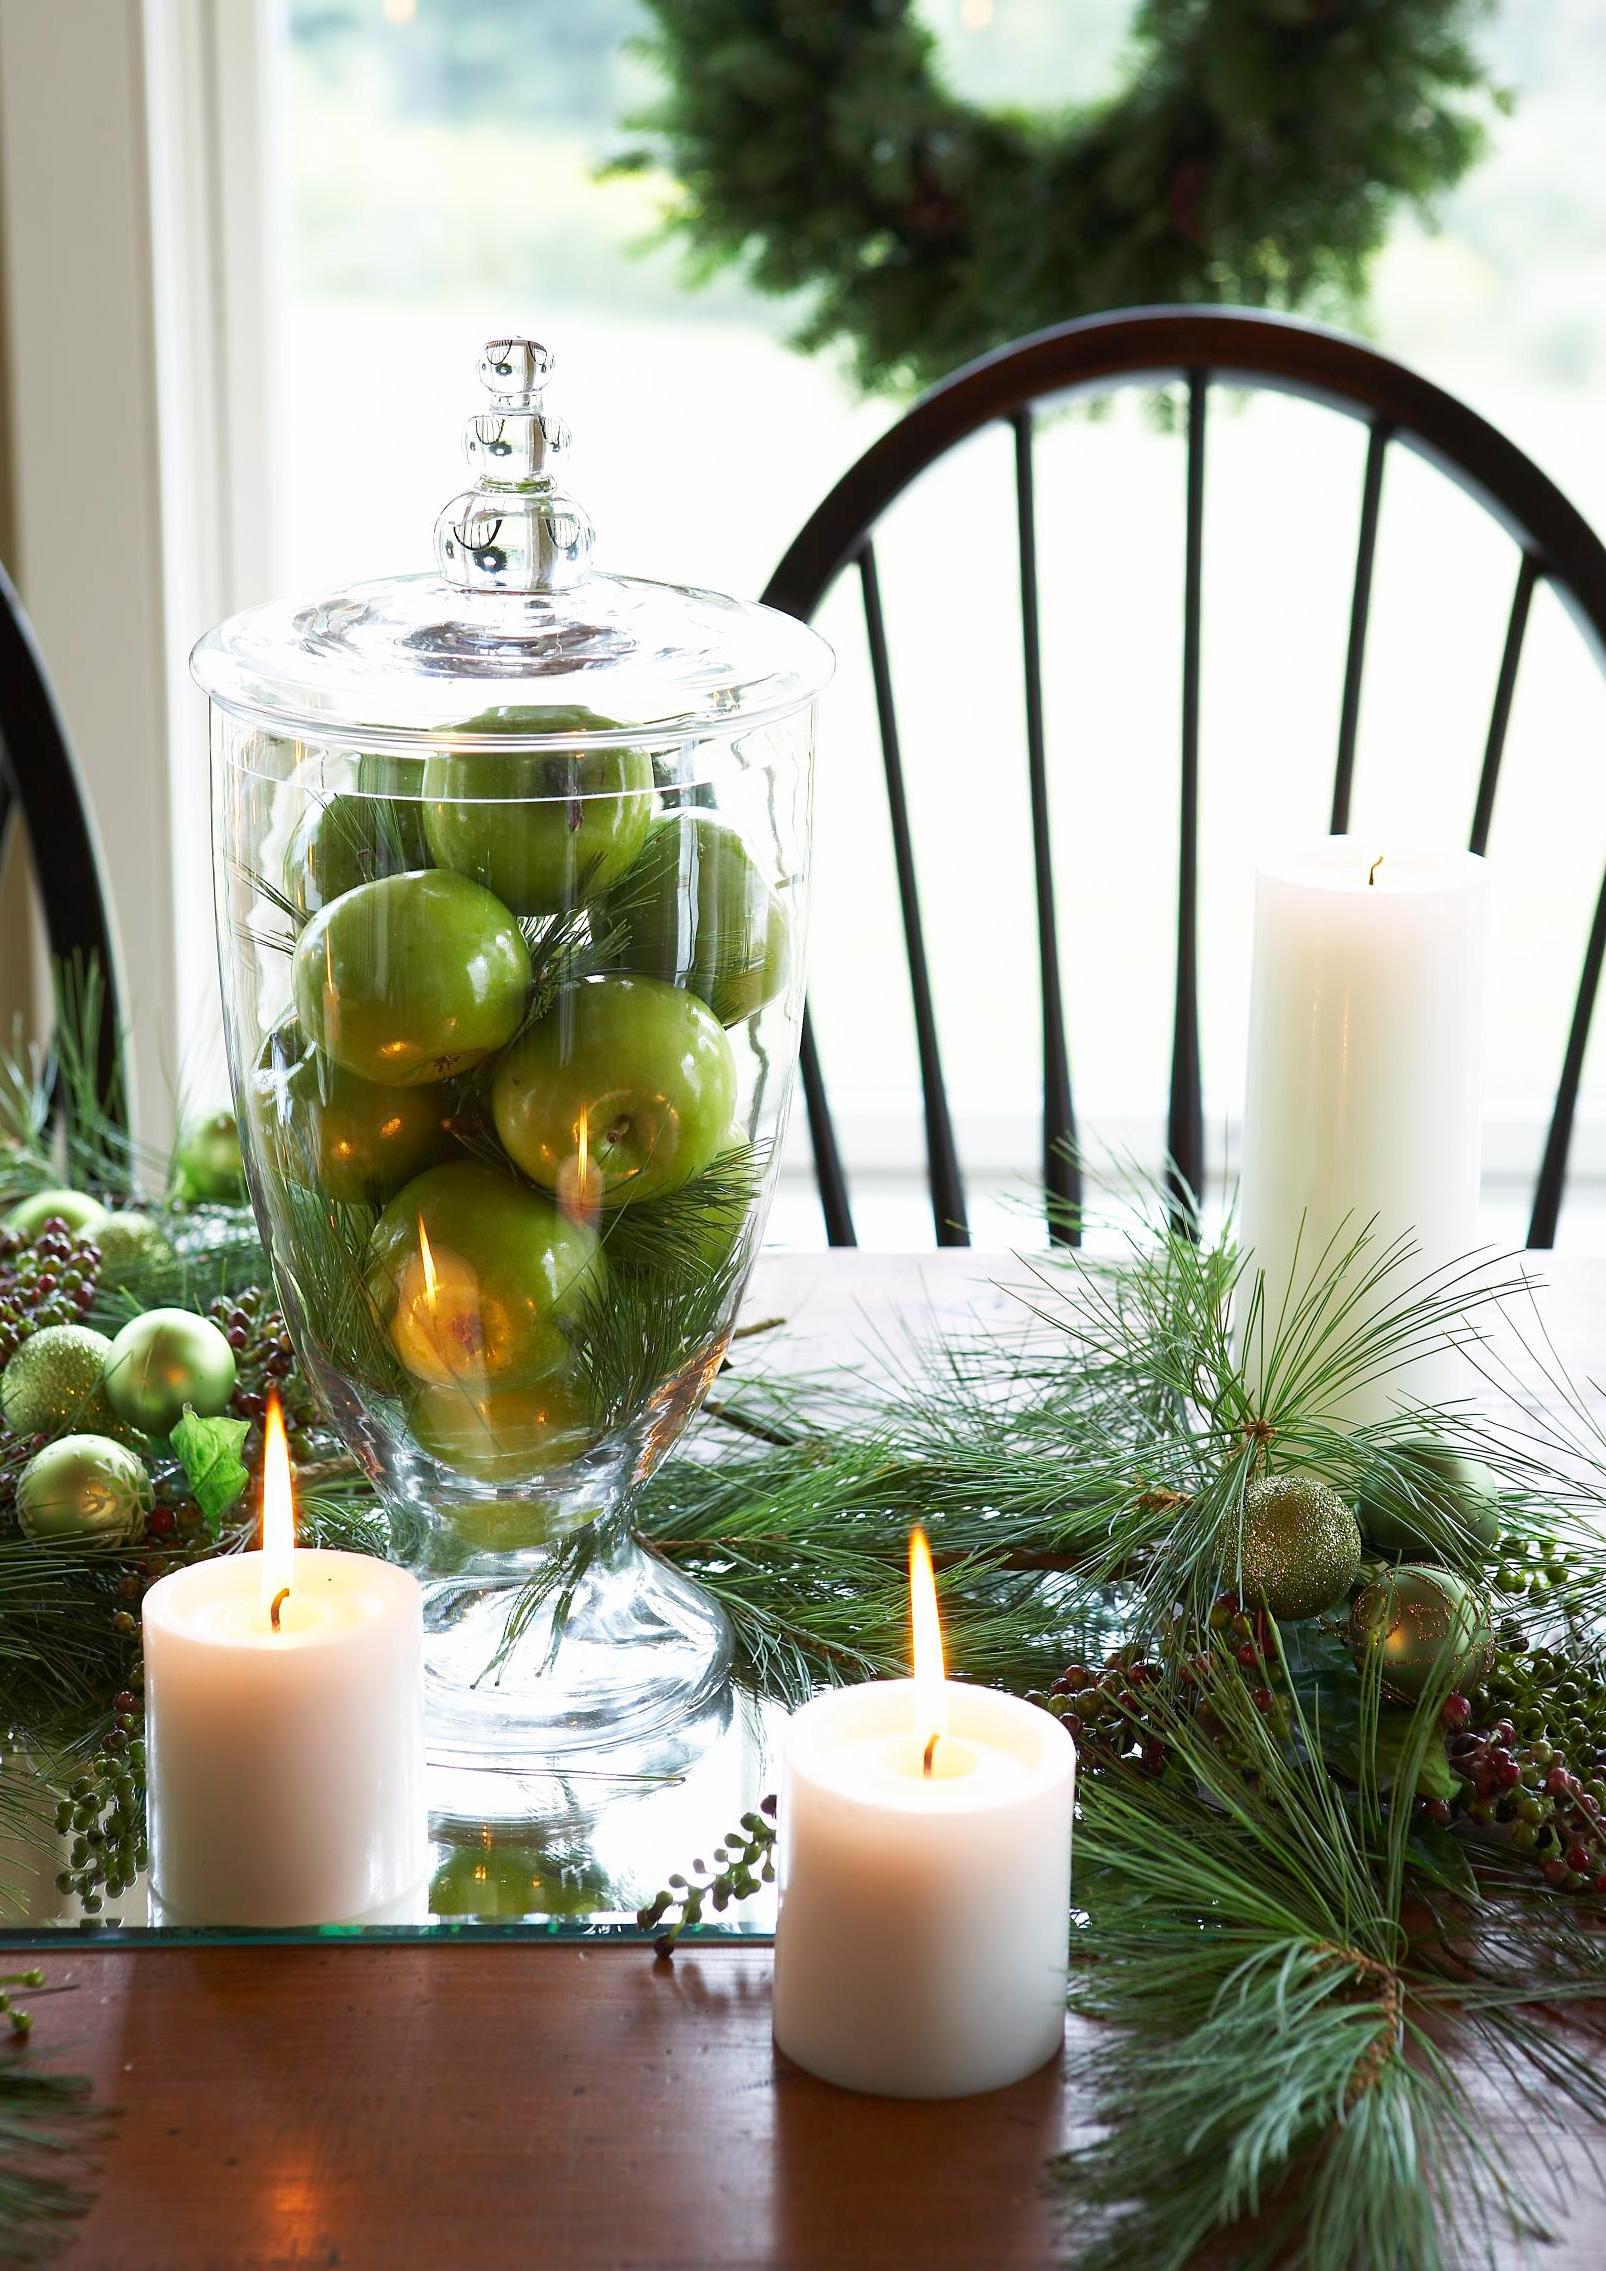 Christmas centerpiece ideas: apples